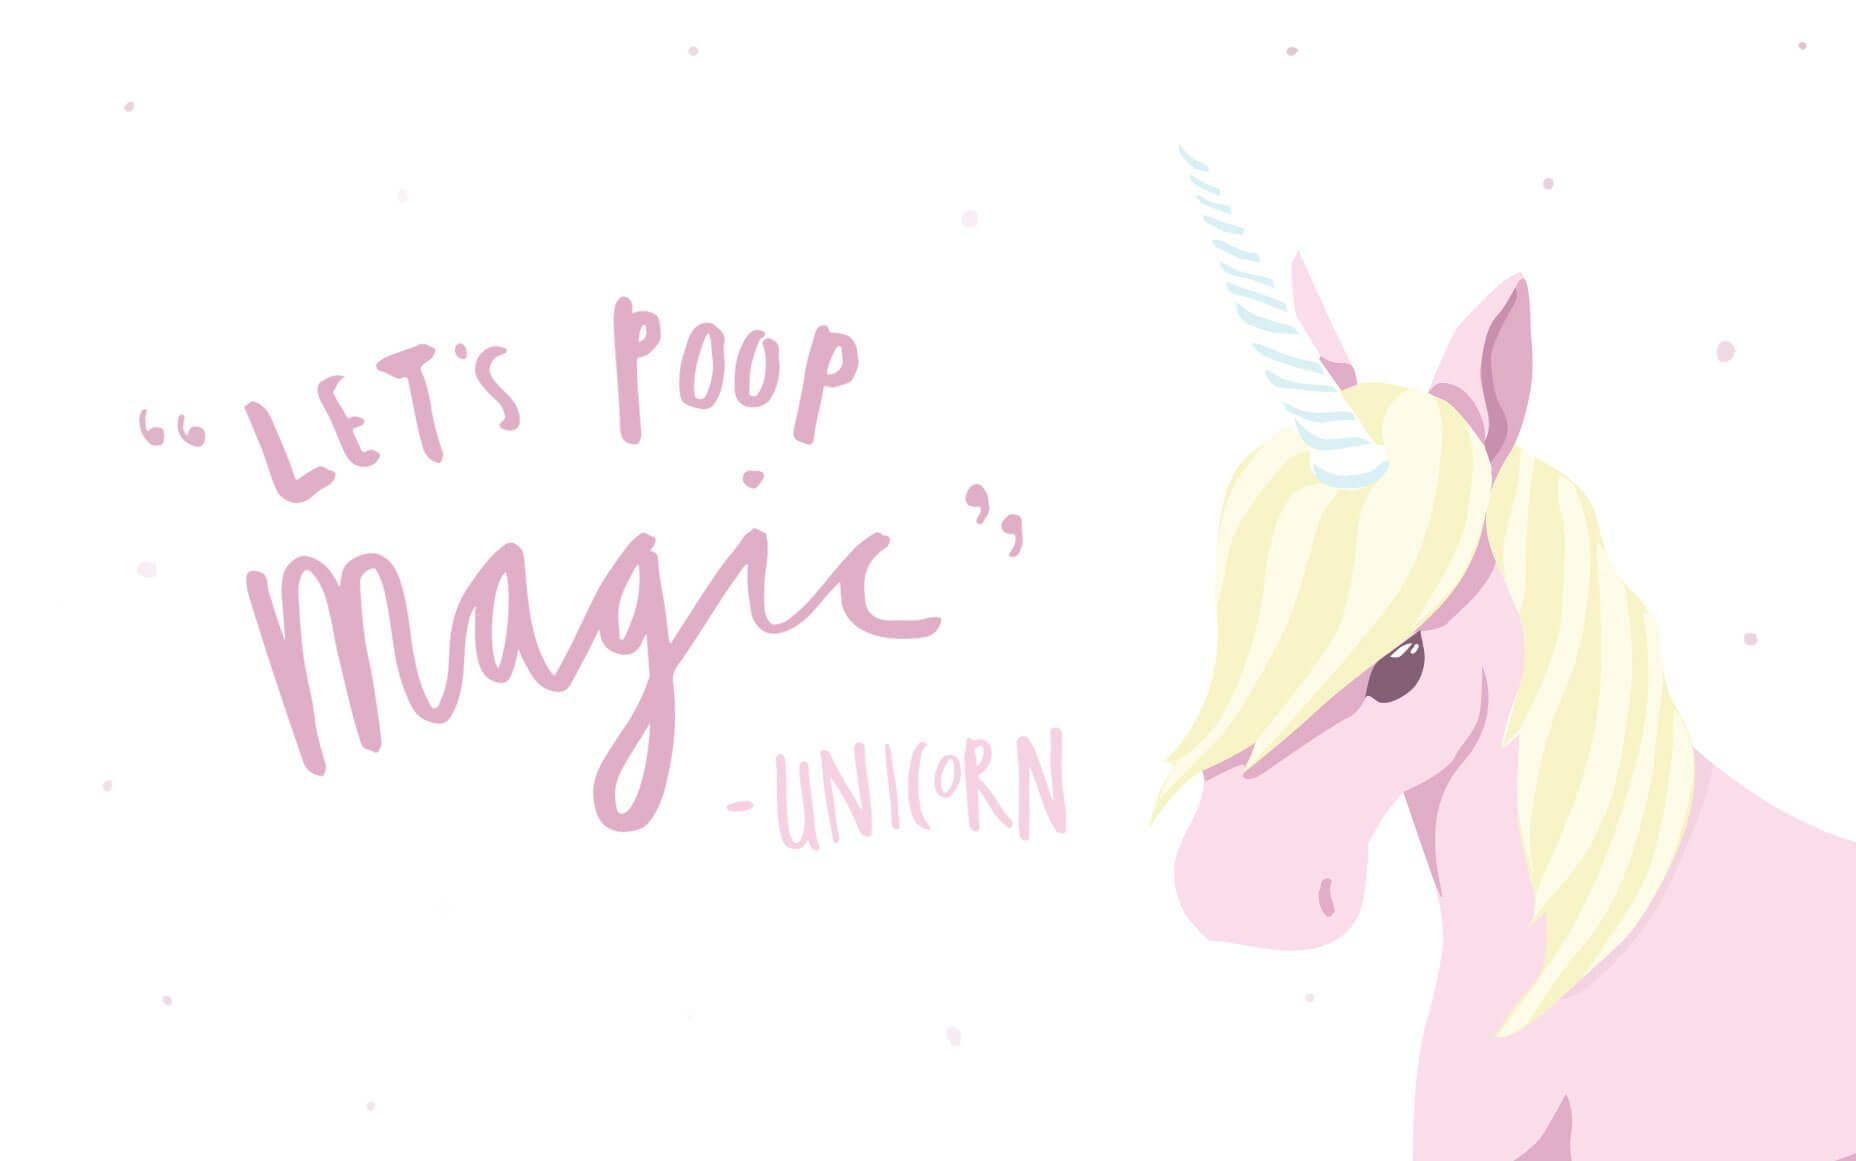 1856x1161 Free Unicorn Wallpaper For Desktop 39 Unicorn Images For Free Cute Laptop Wallpaper Unicorn Wallpaper Cute Unicorn Wallpaper